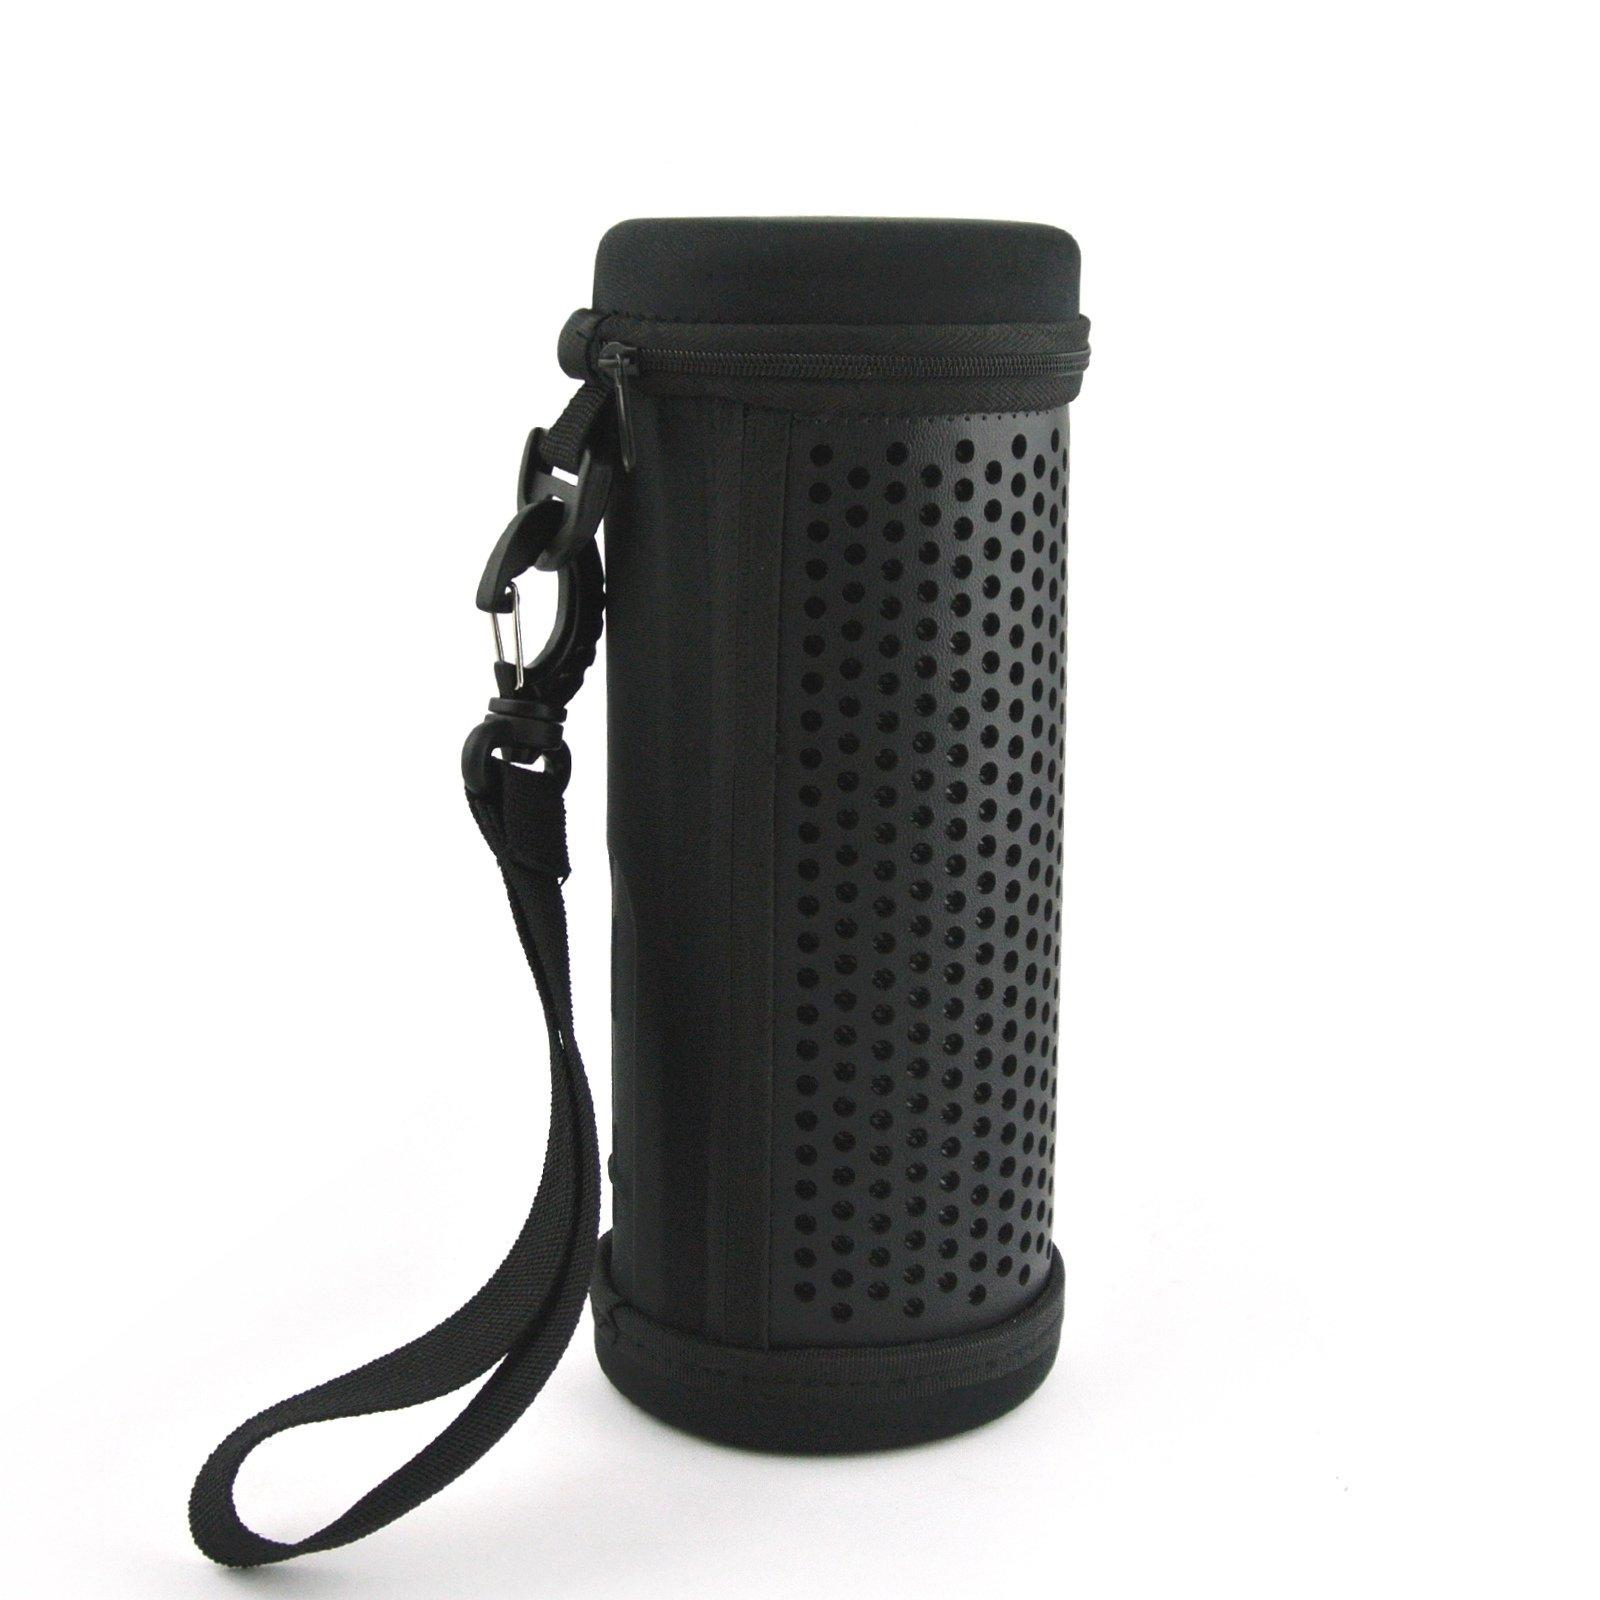 XBERSTAR PU Leather Travel Carry Case Bag for Logitech UE Megaboom Wireless Bluetooth Speaker